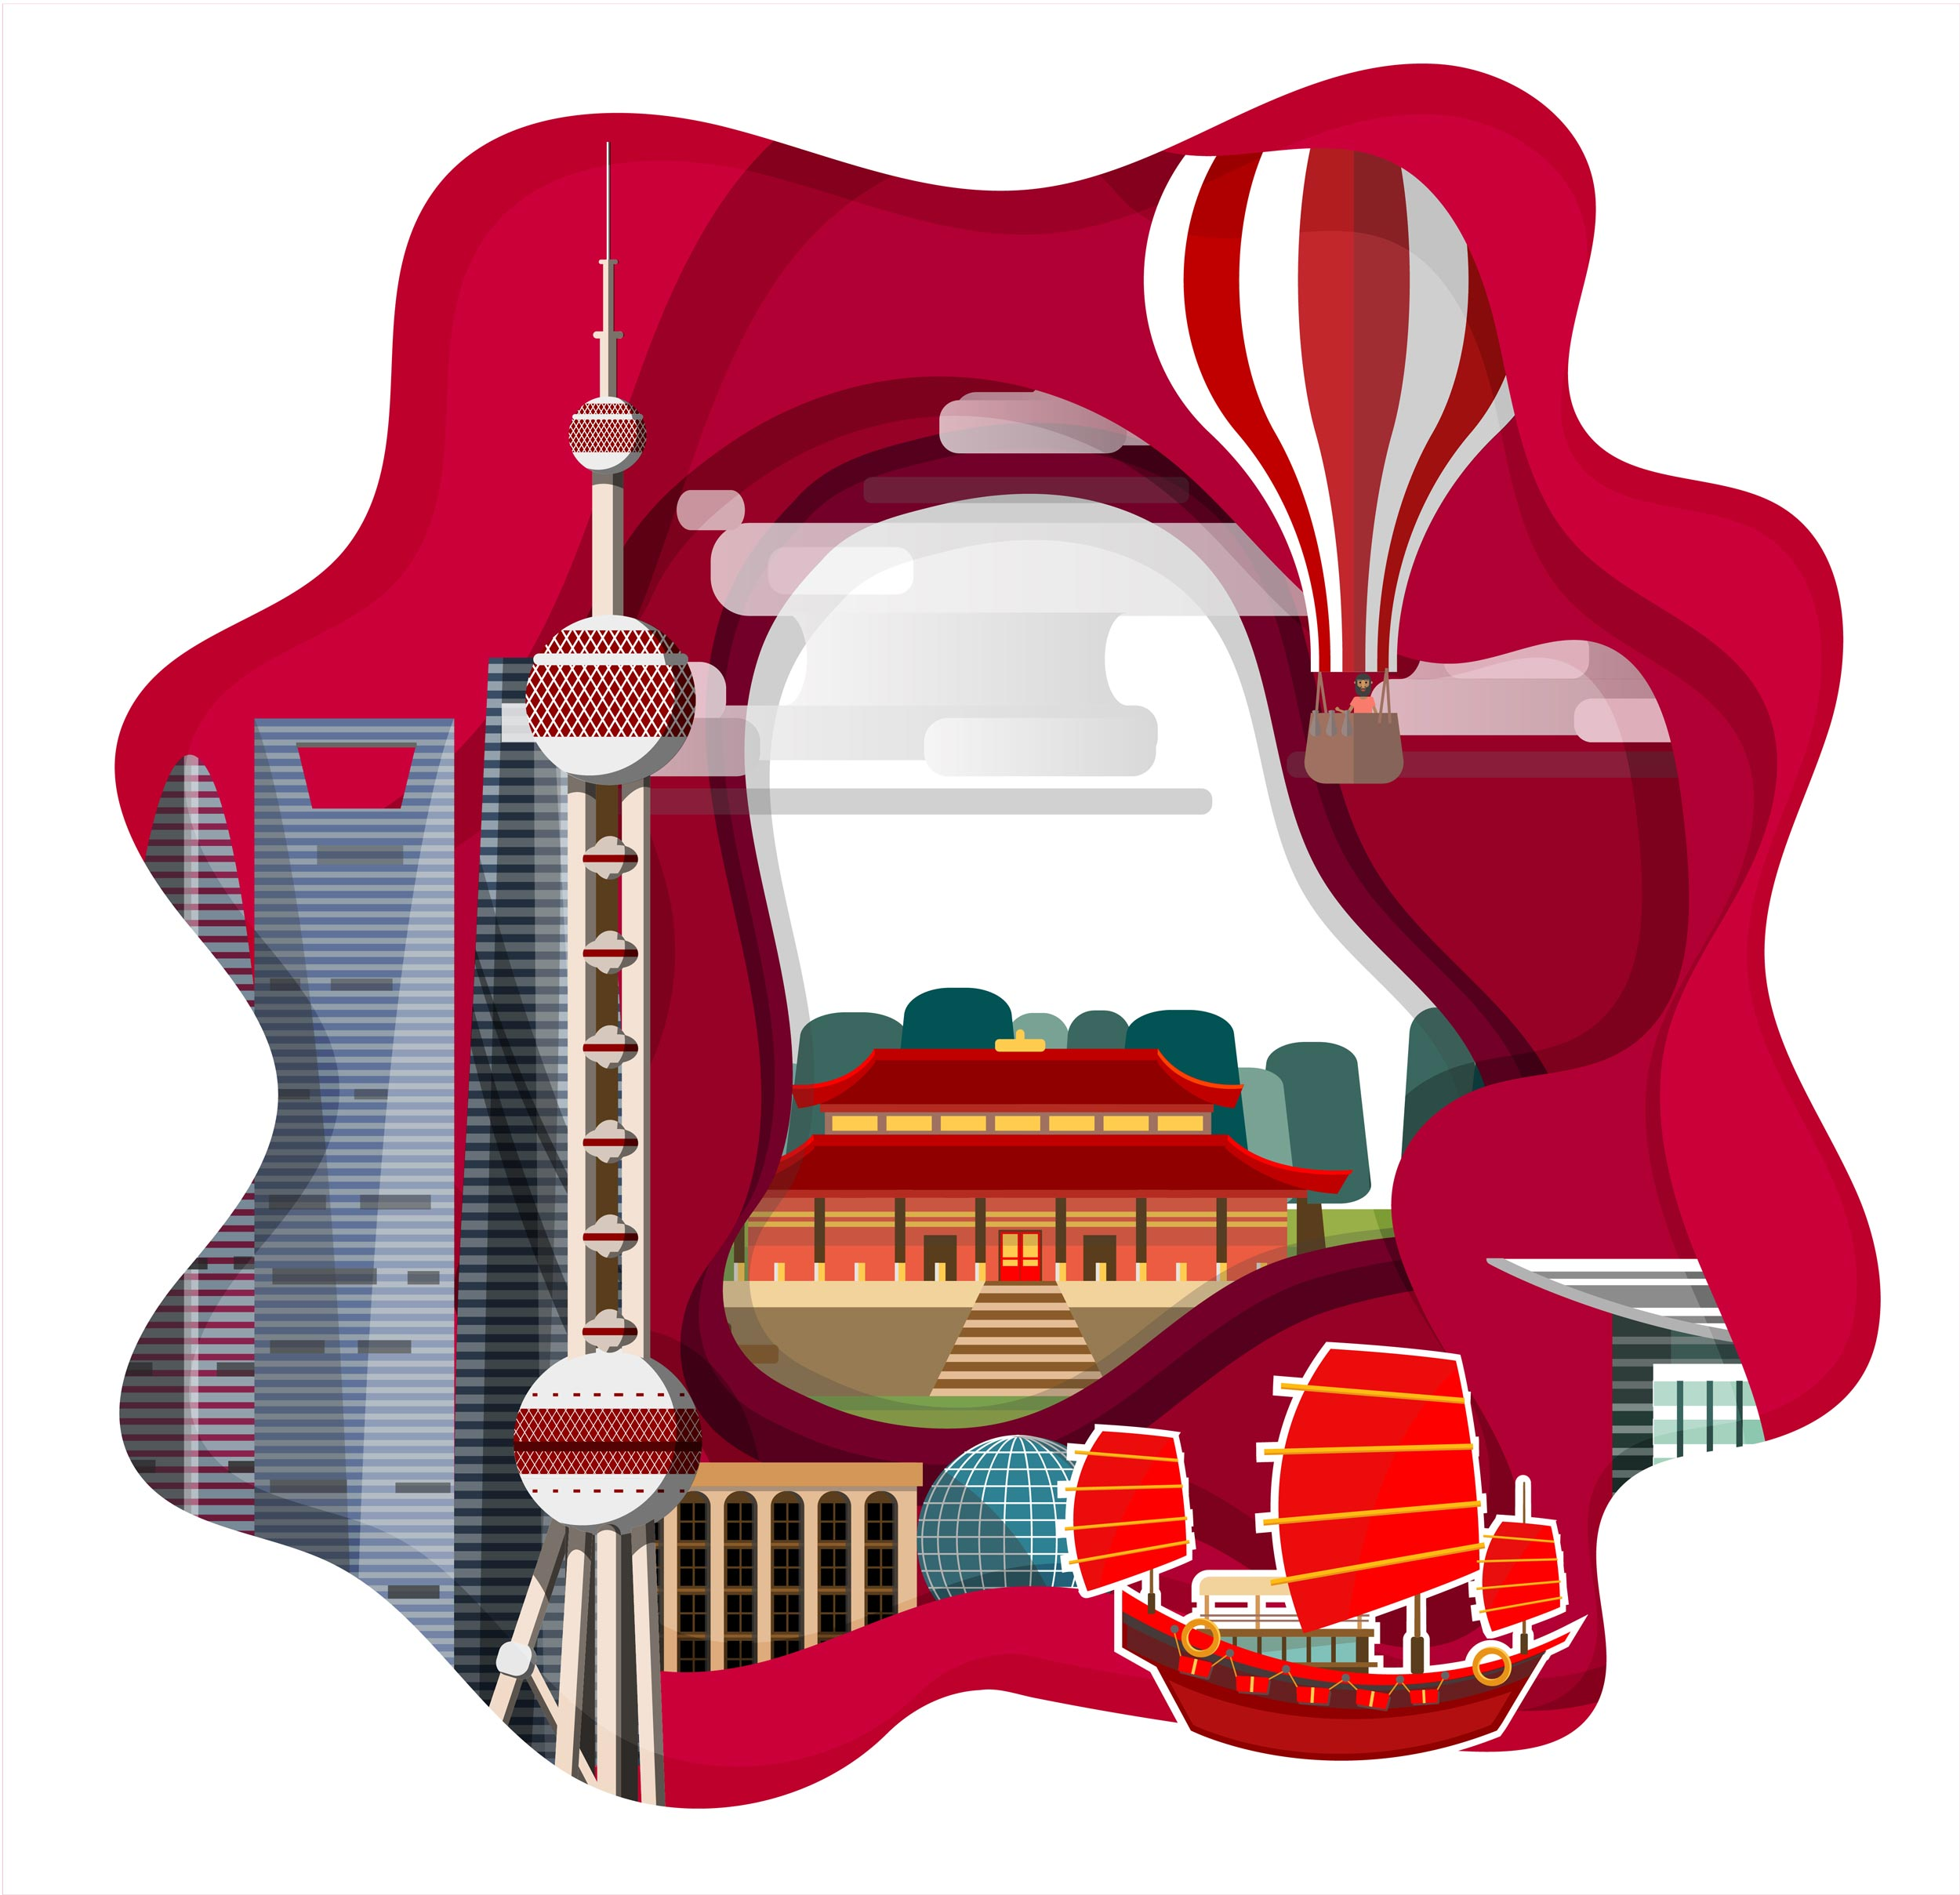 <span class='yzk_title_62121'>时尚简约扁平化风格的中国风中国标志性城市建筑</span>